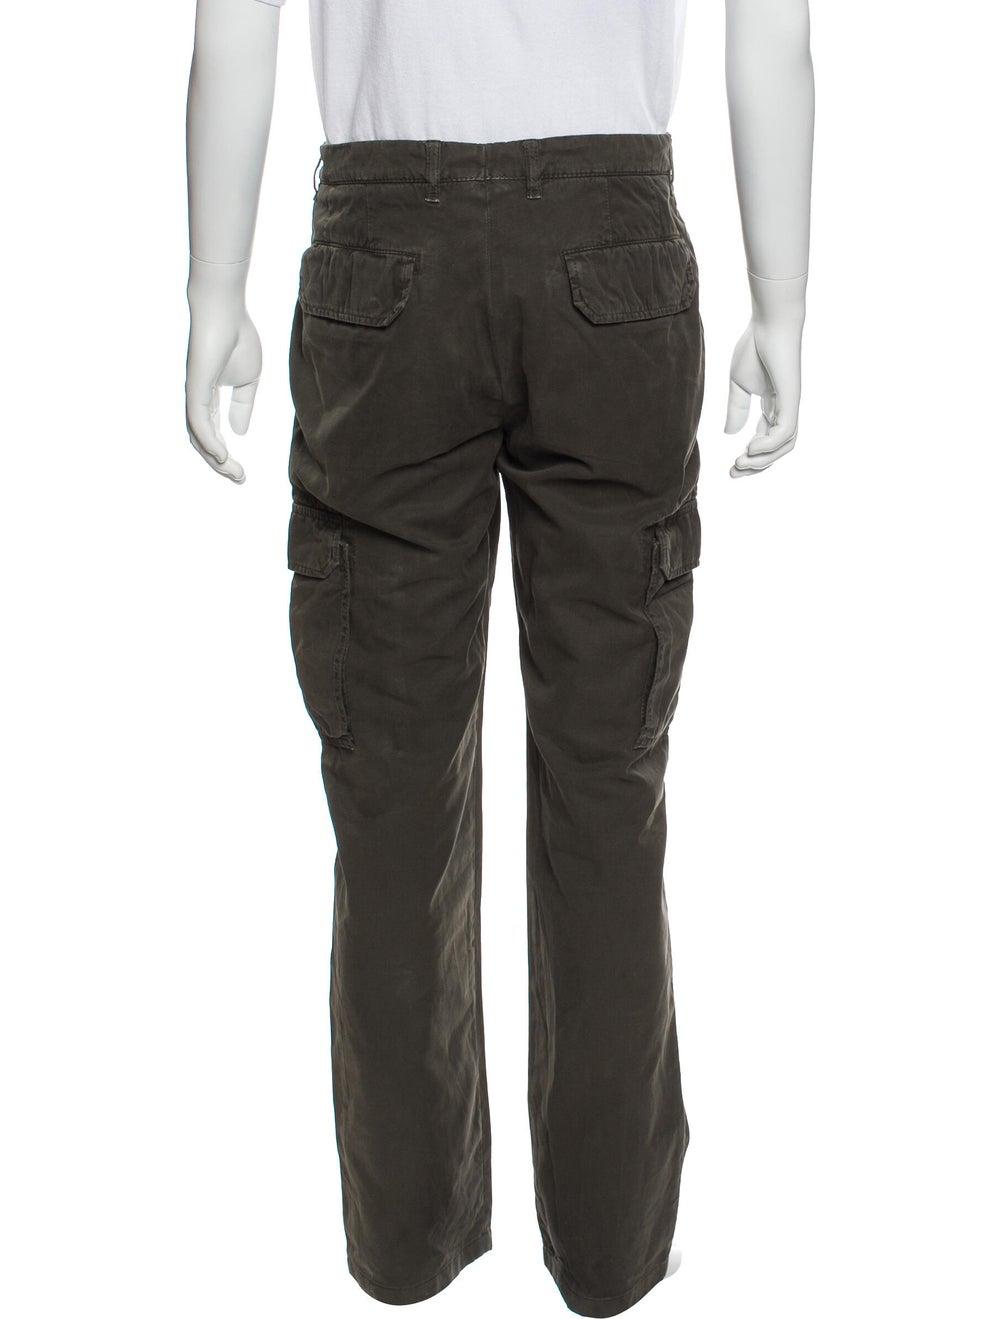 Brunello Cucinelli Cargo Pants Green - image 3